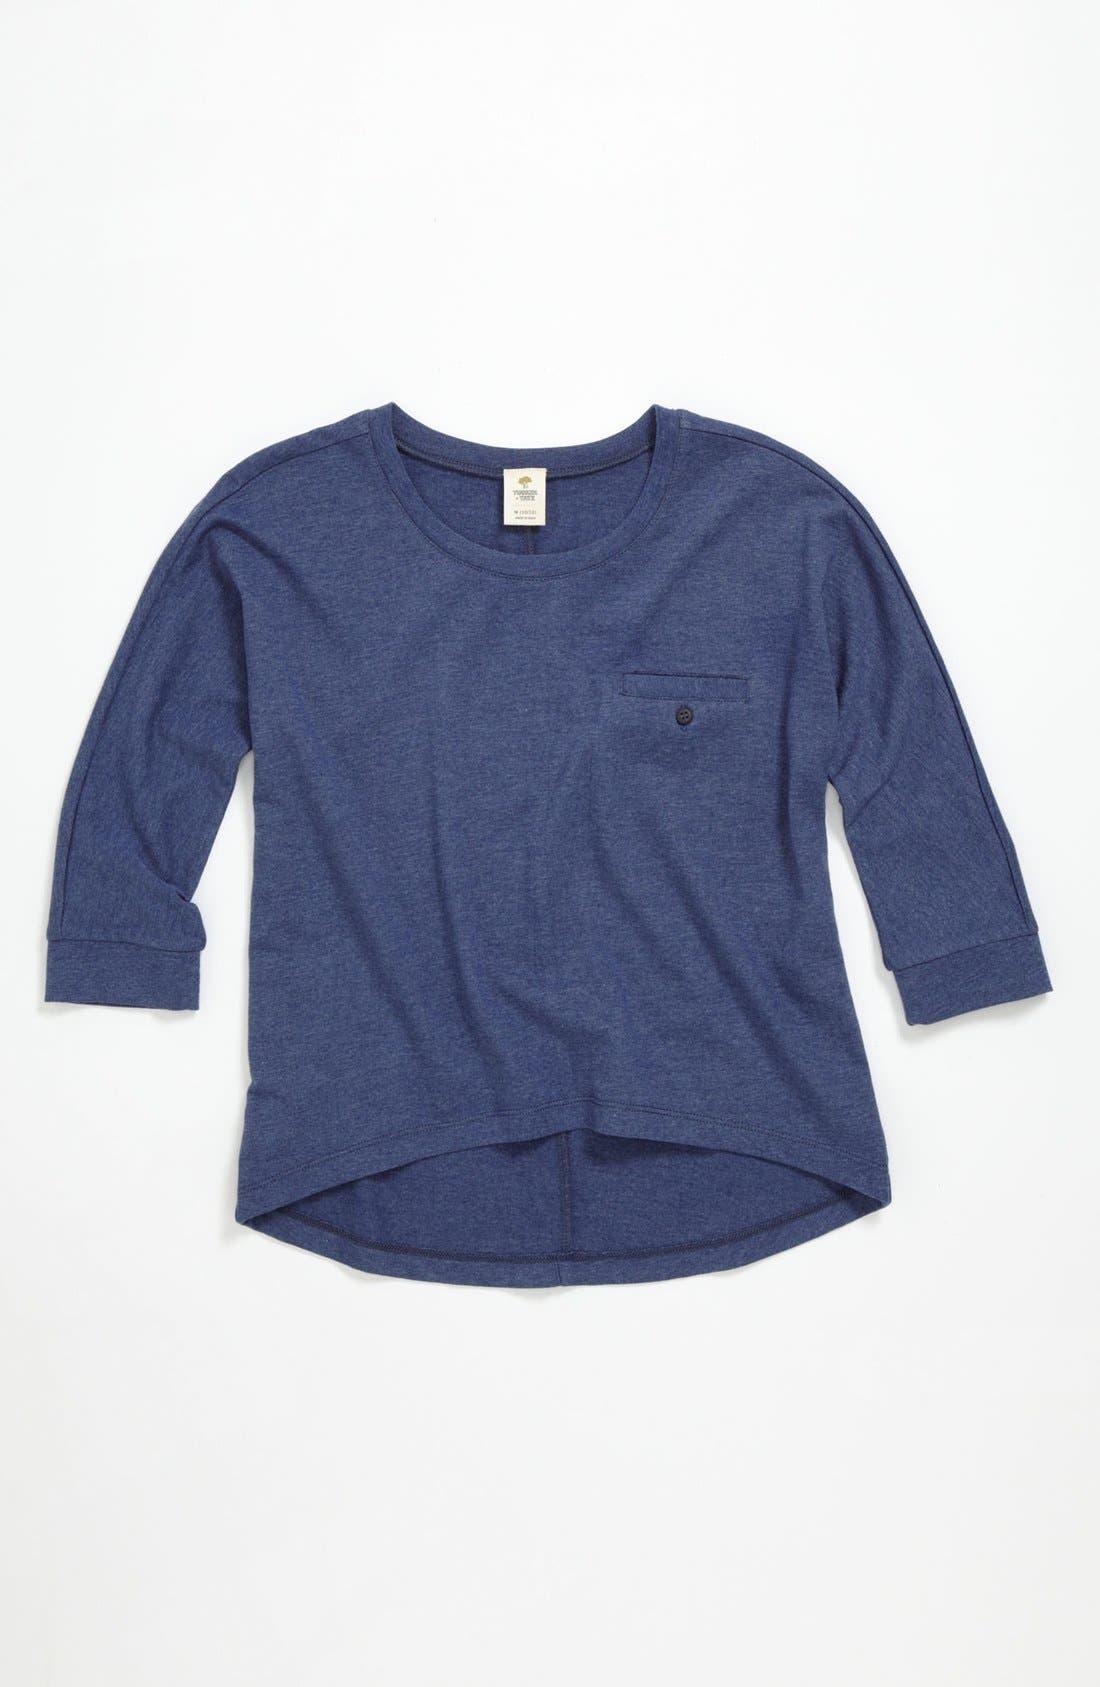 Alternate Image 1 Selected - Tucker + Tate 'Gena' Knit Top (Big Girls)